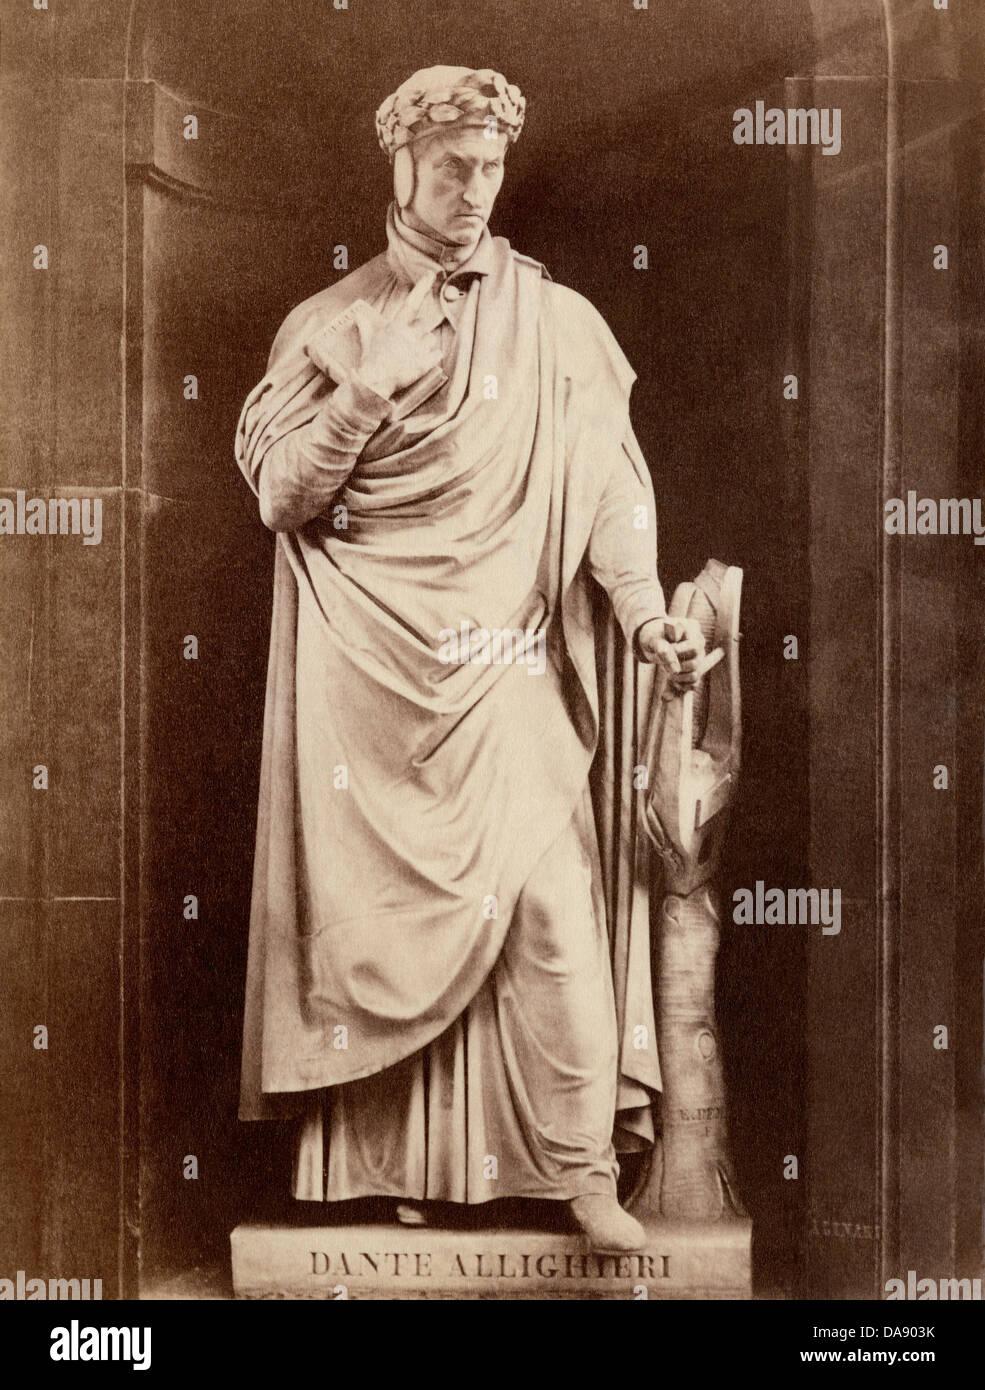 Statue of Dante Alighieri. Photograph - Stock Image